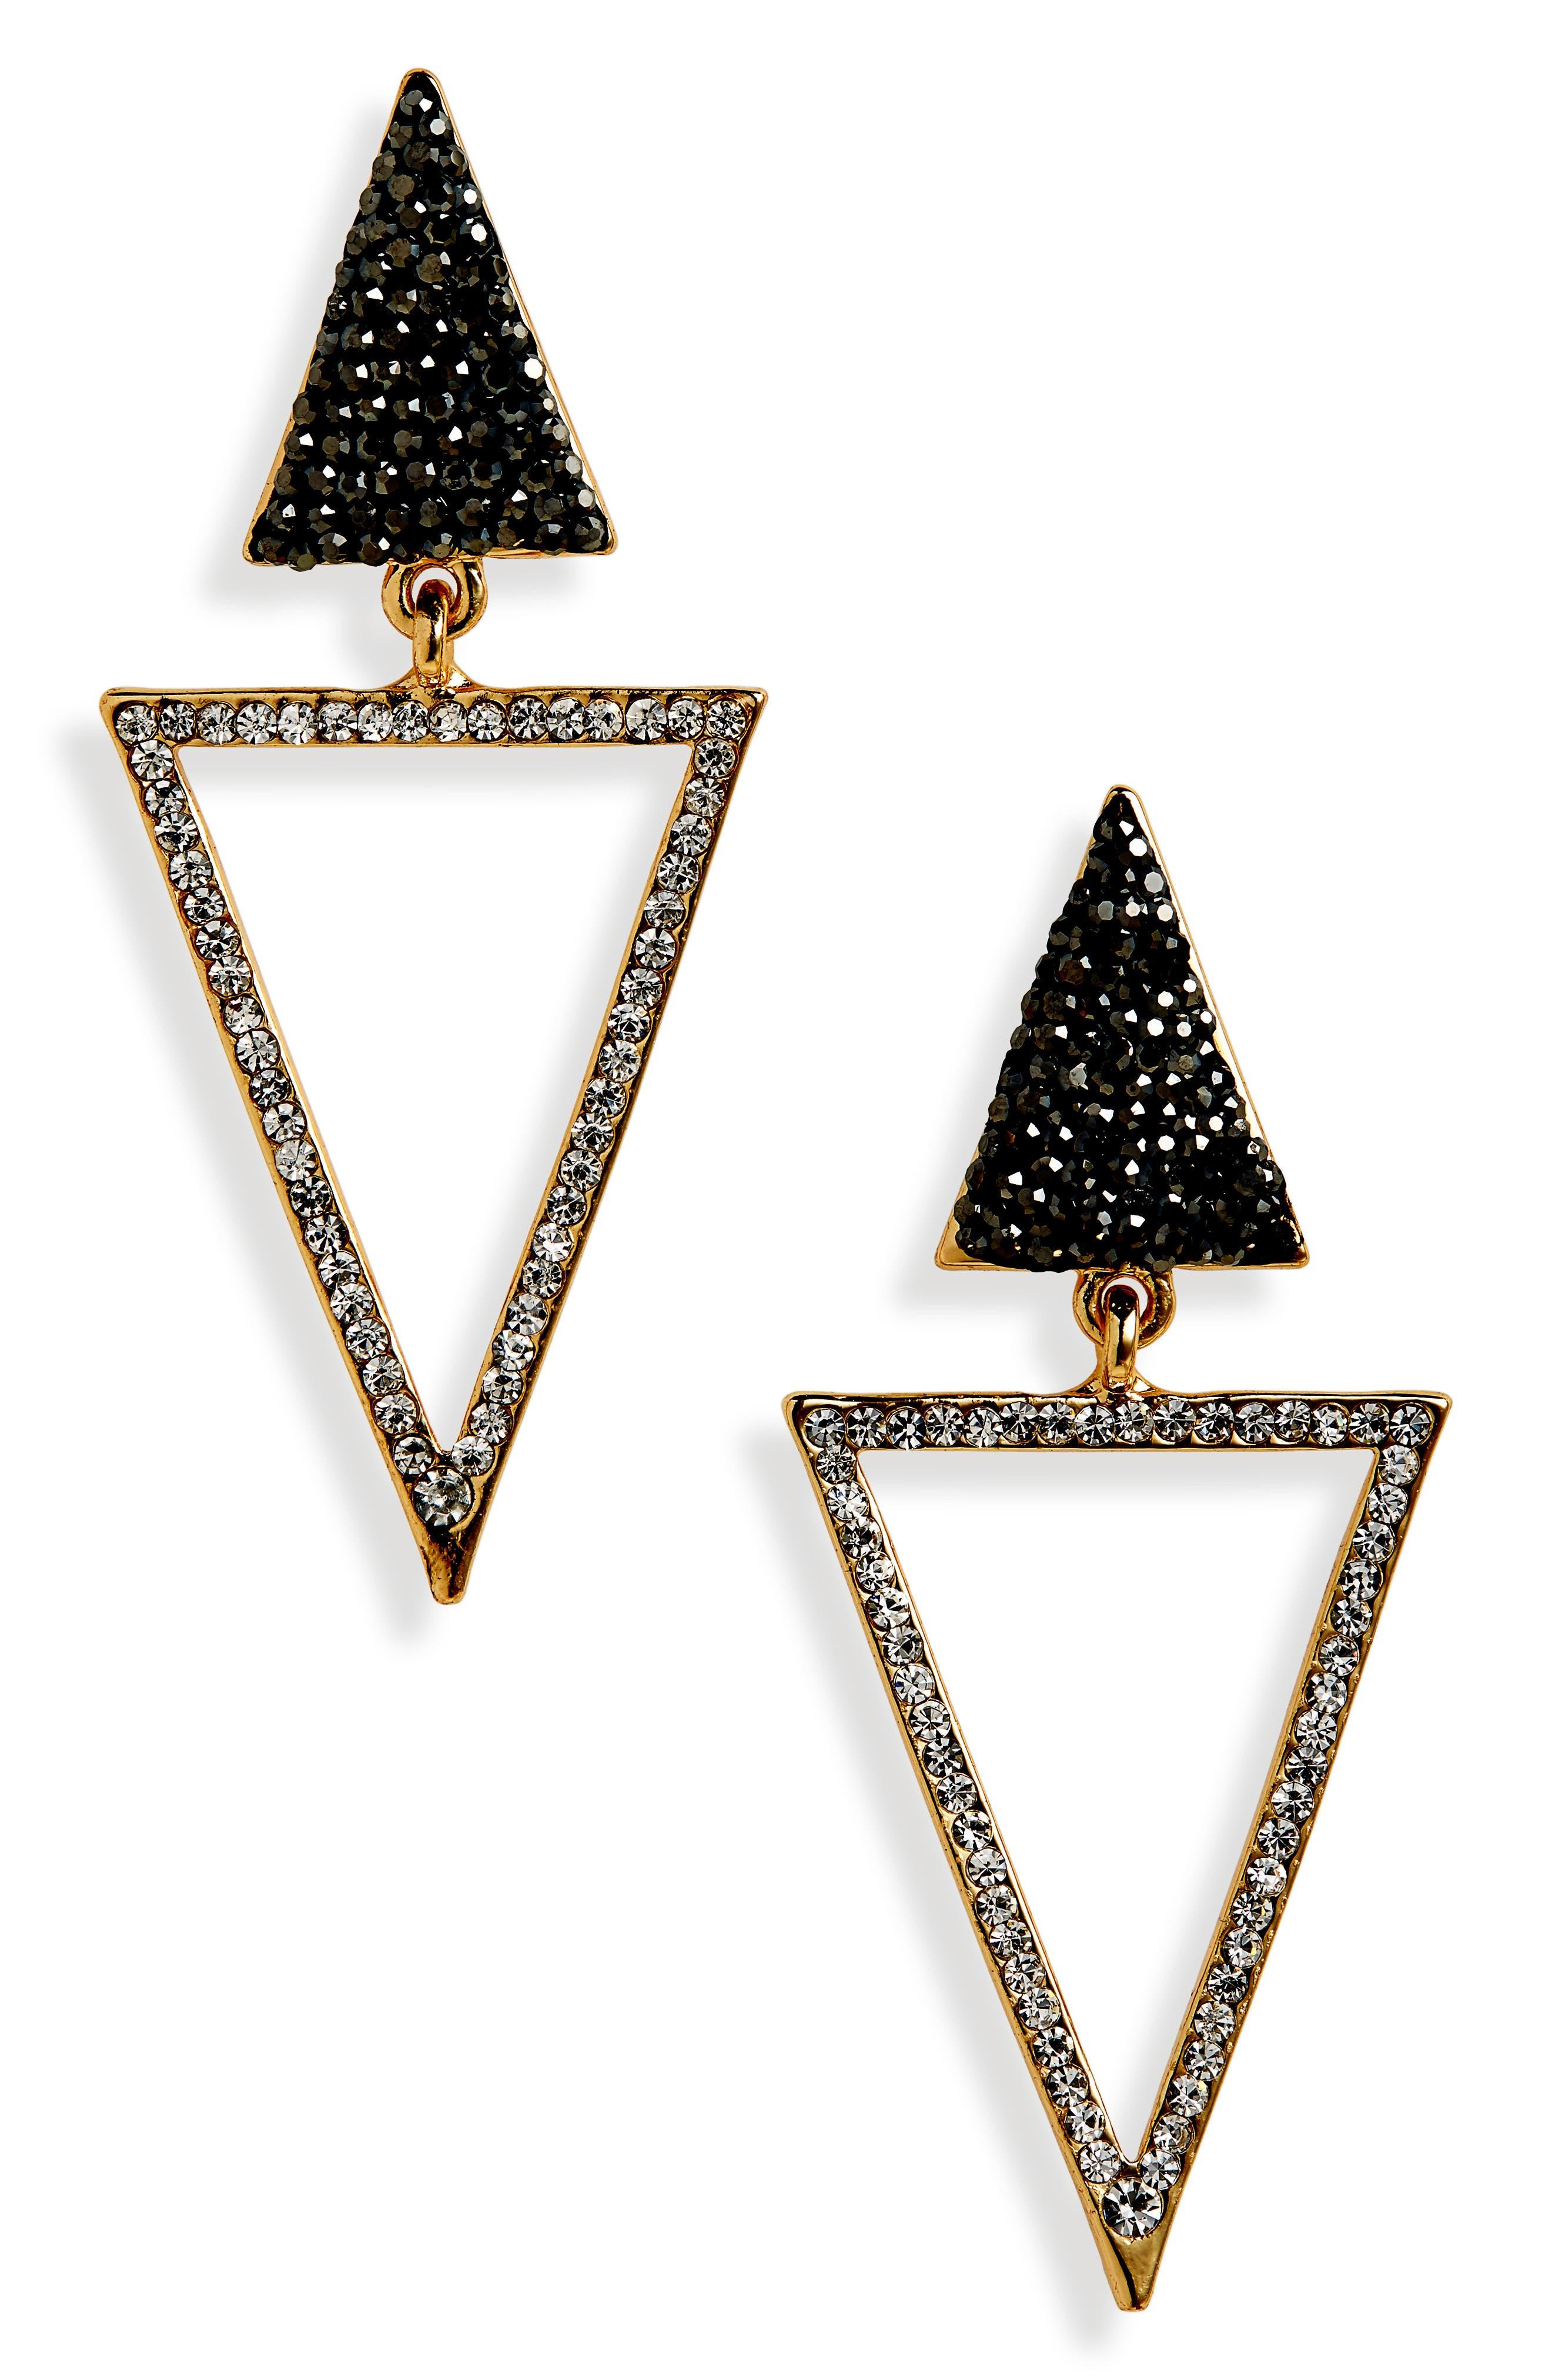 PANACEA Crystal Triangle Drop Earrings in Grey Multi